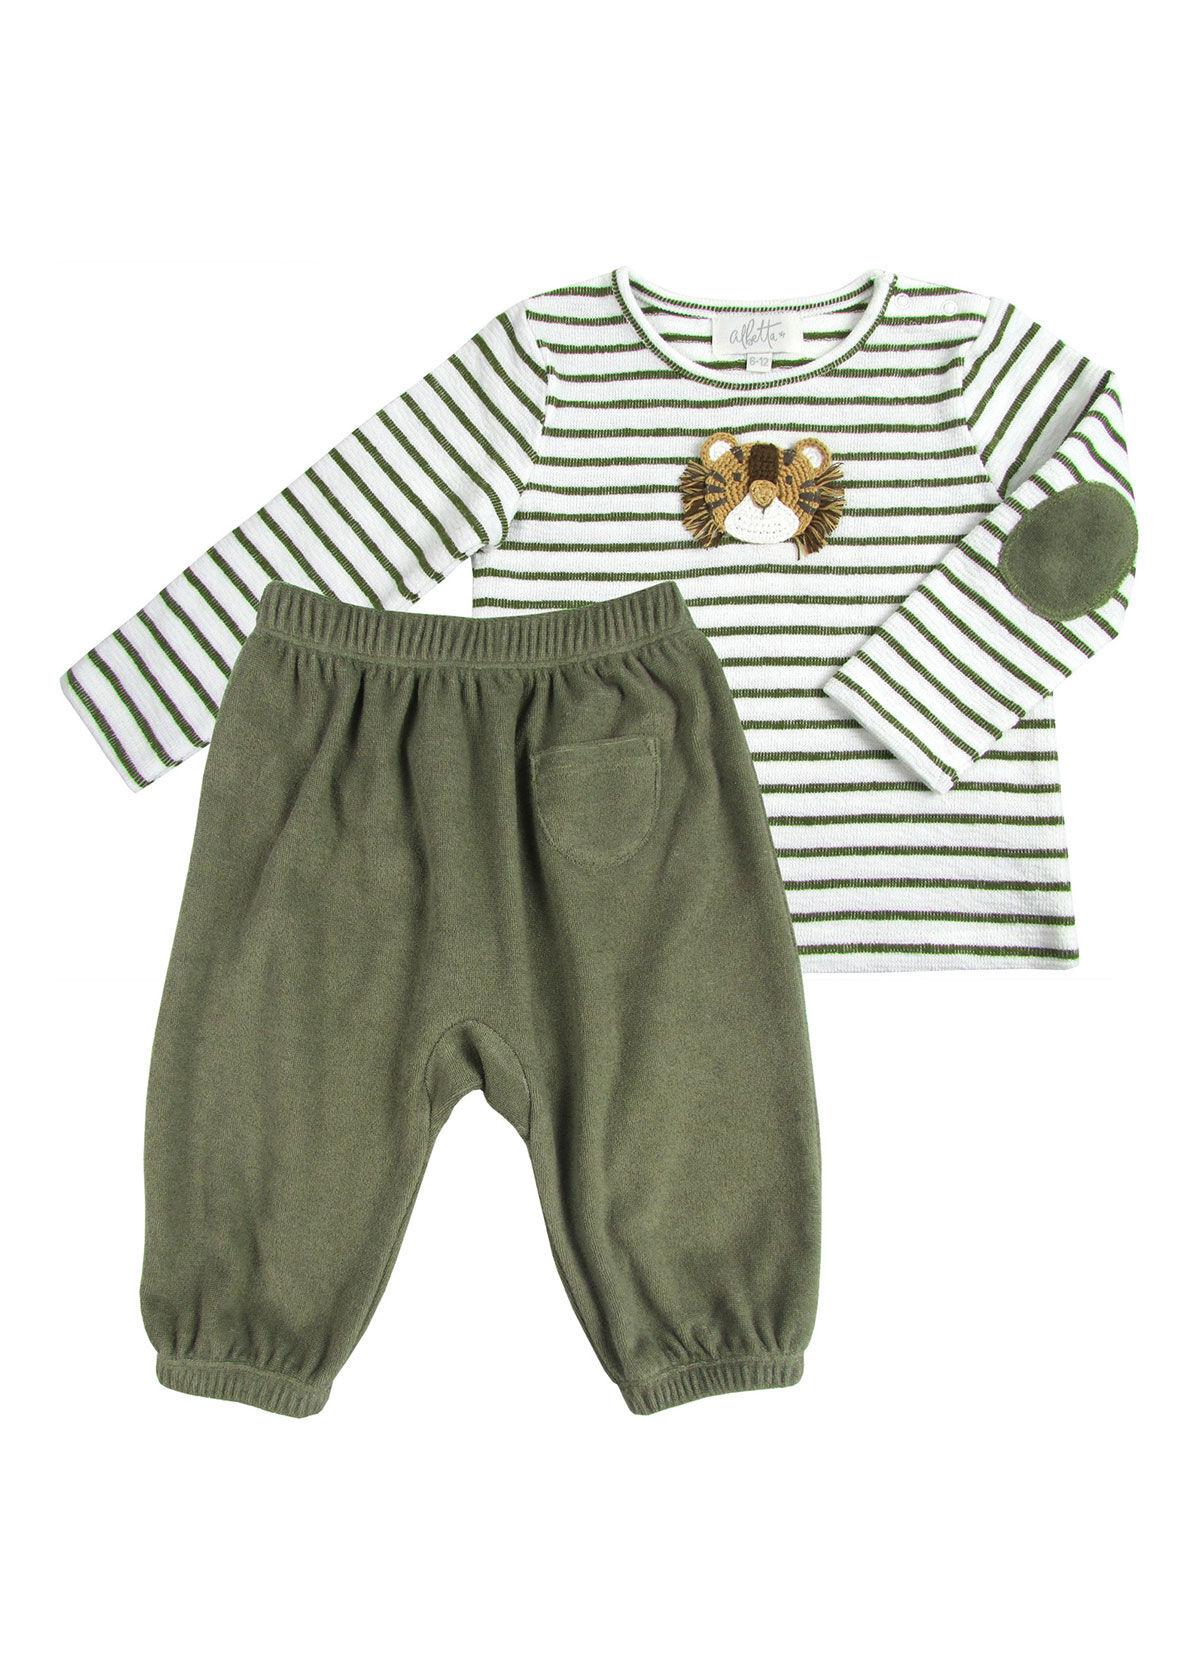 Albetta Crochet Tiger Playset 2 Piece  - male - GREEN - Size: 6-12 Months